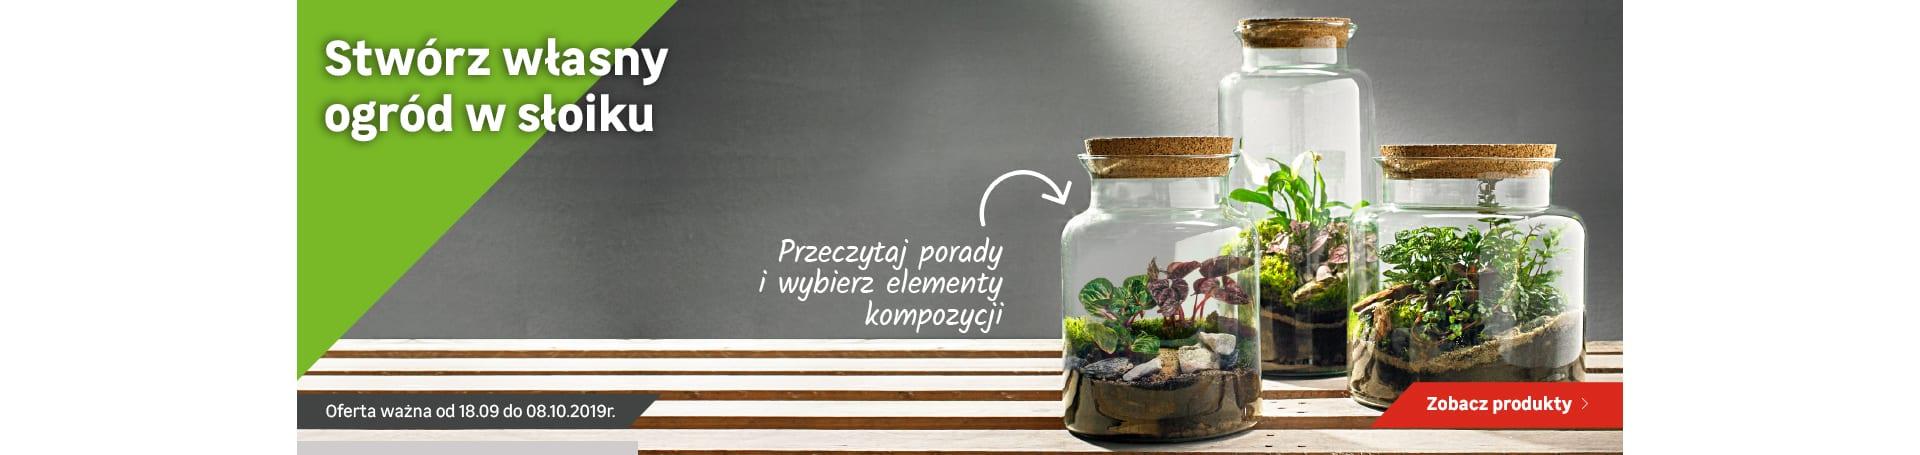 ps-ogrod-w-sloiku-18.09-08.10.2019-1323x455